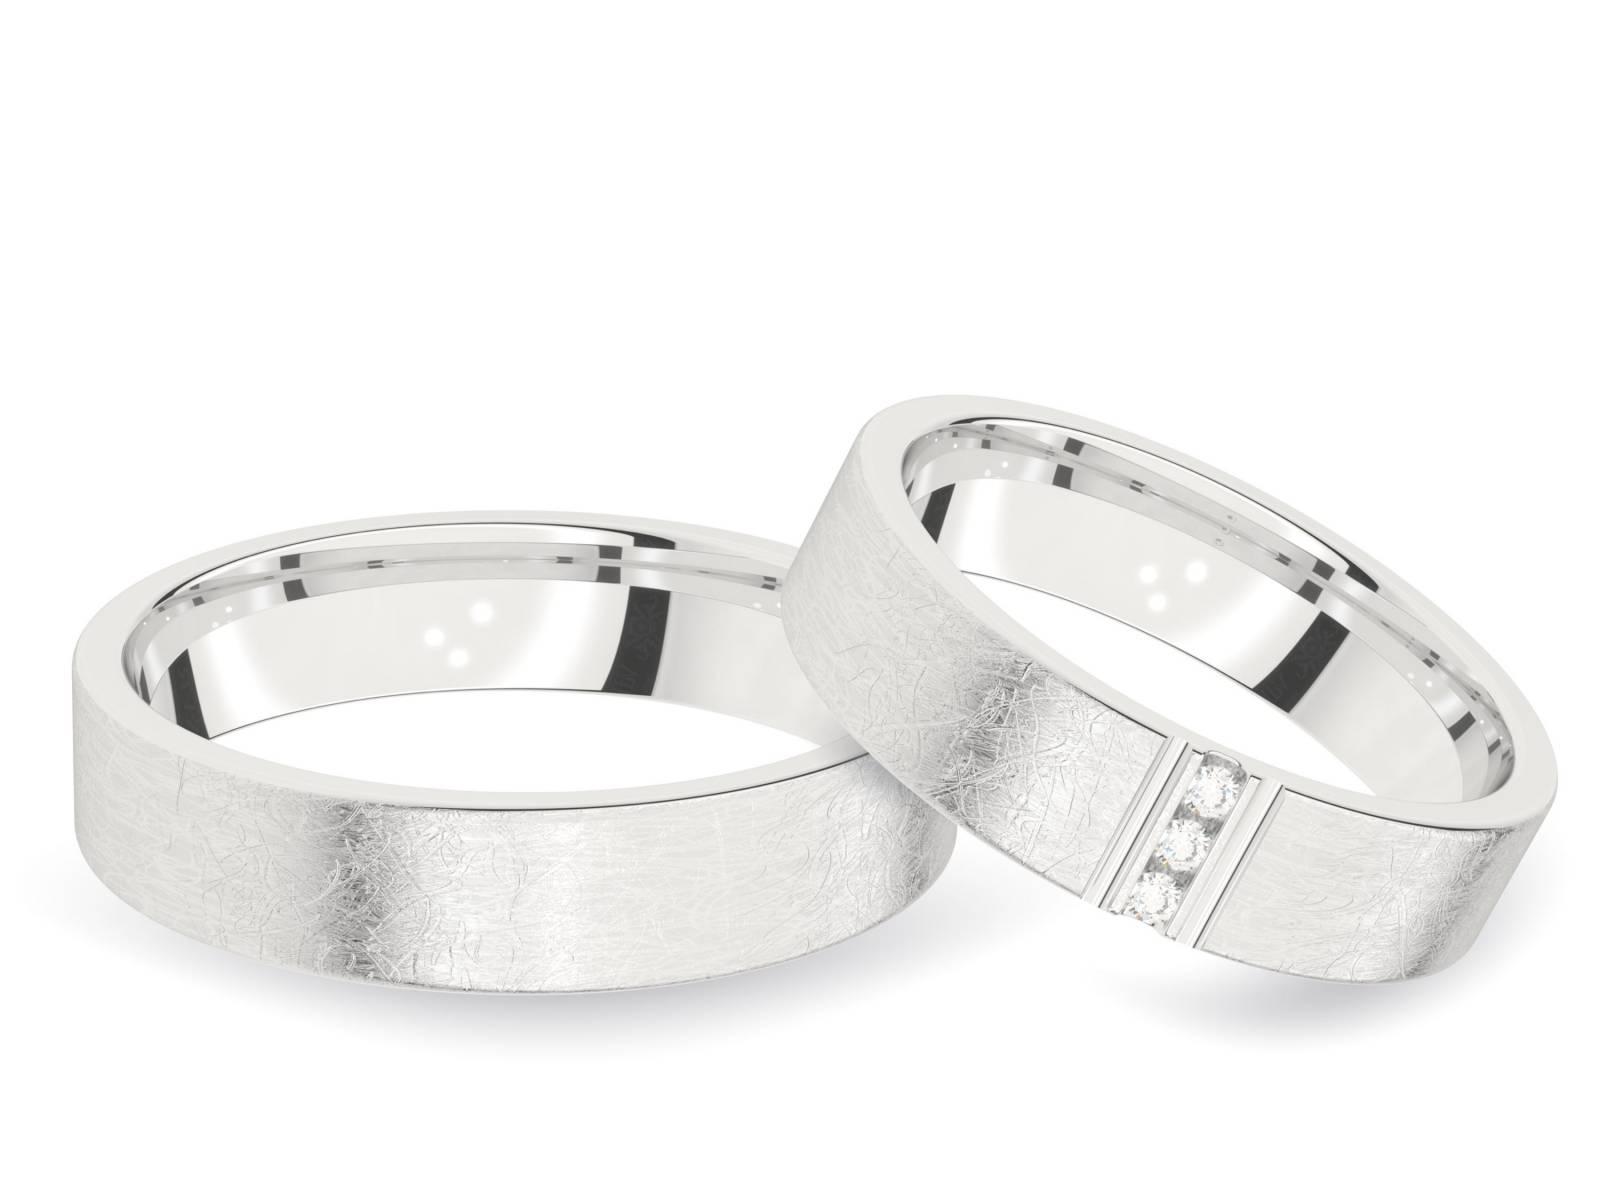 Jan Maes Juwelen - Trouwringen - Verlovingsringen - Juwelen - House of Weddings - 12